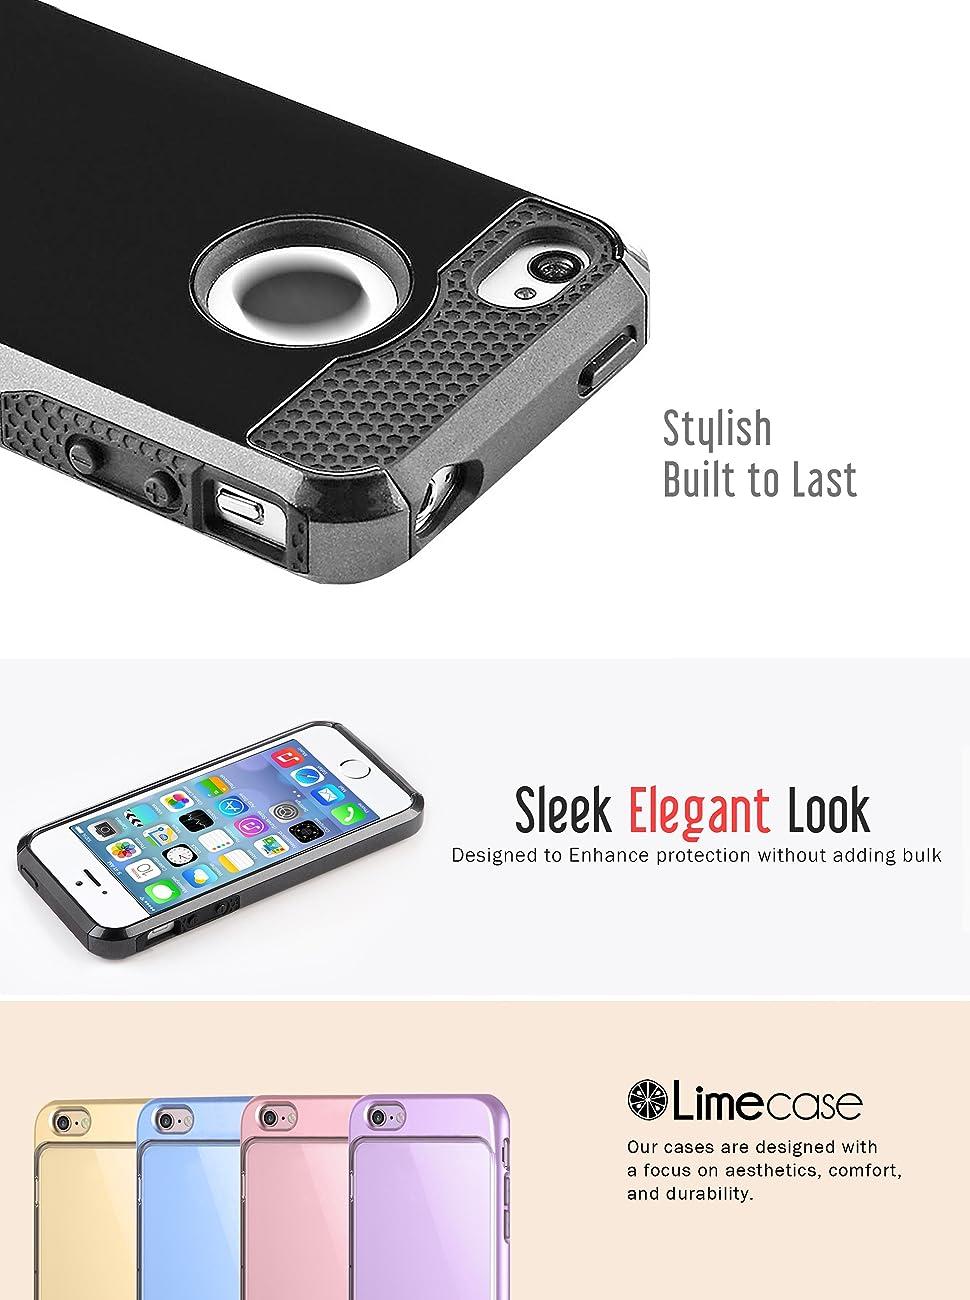 Amazon.com: iPhone SE Case, for iPhone 5s 5 SE Limecase